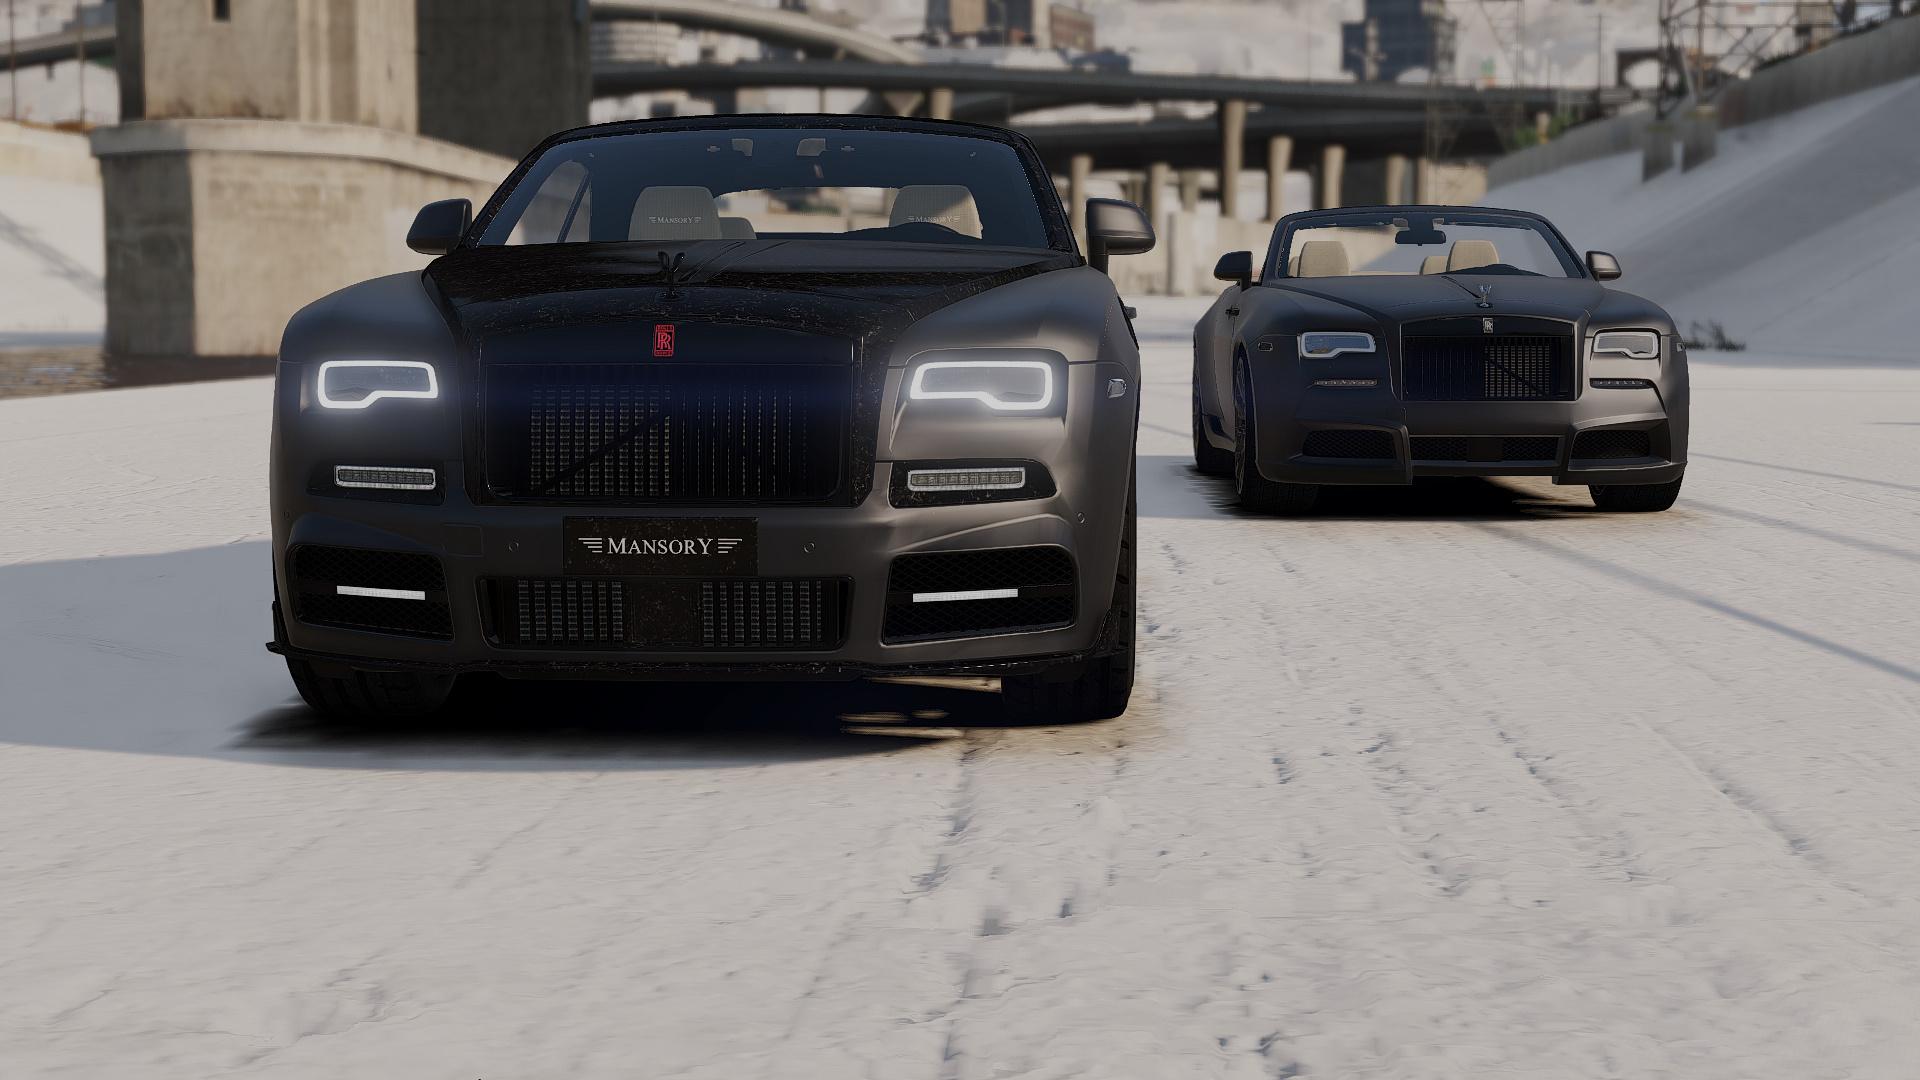 Rolls Royce Dawn Mansory Gta5 Mods Com